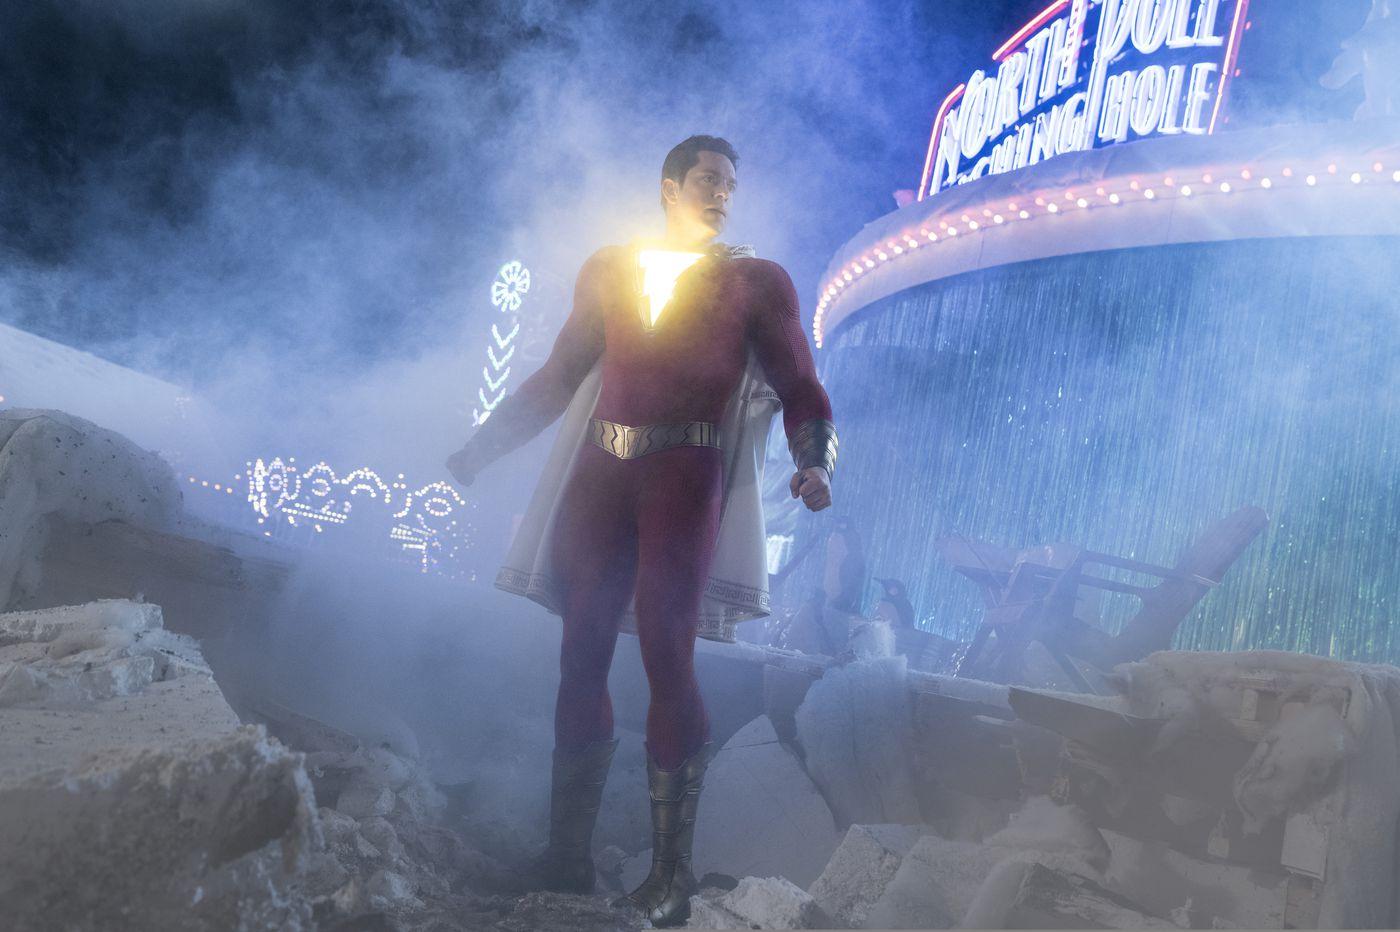 'Shazam!': A superhero rises in Philadelphia | Movie review